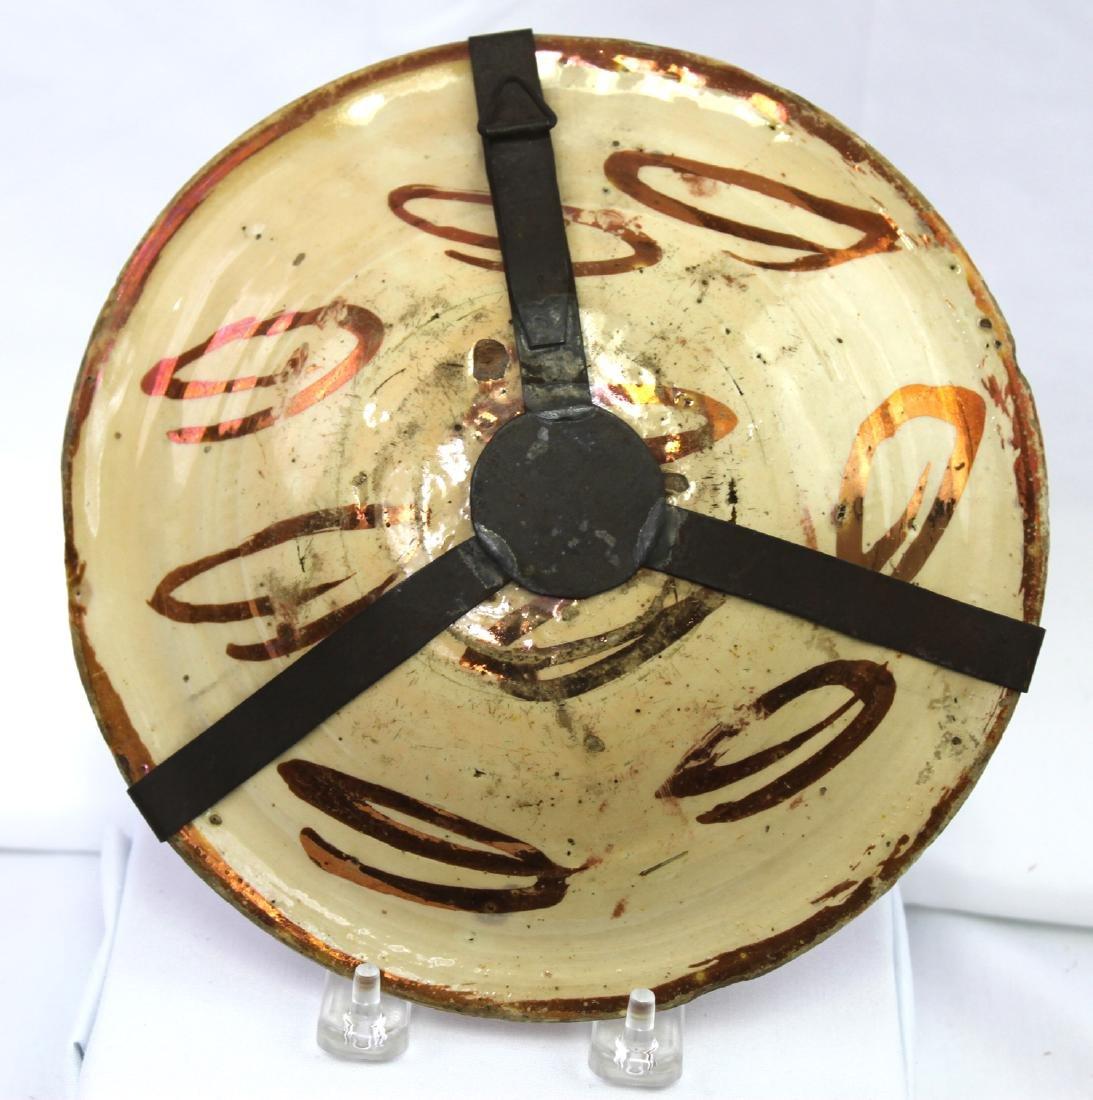 16 Century Italian or Hispano Ceramic Dish Luster - 3